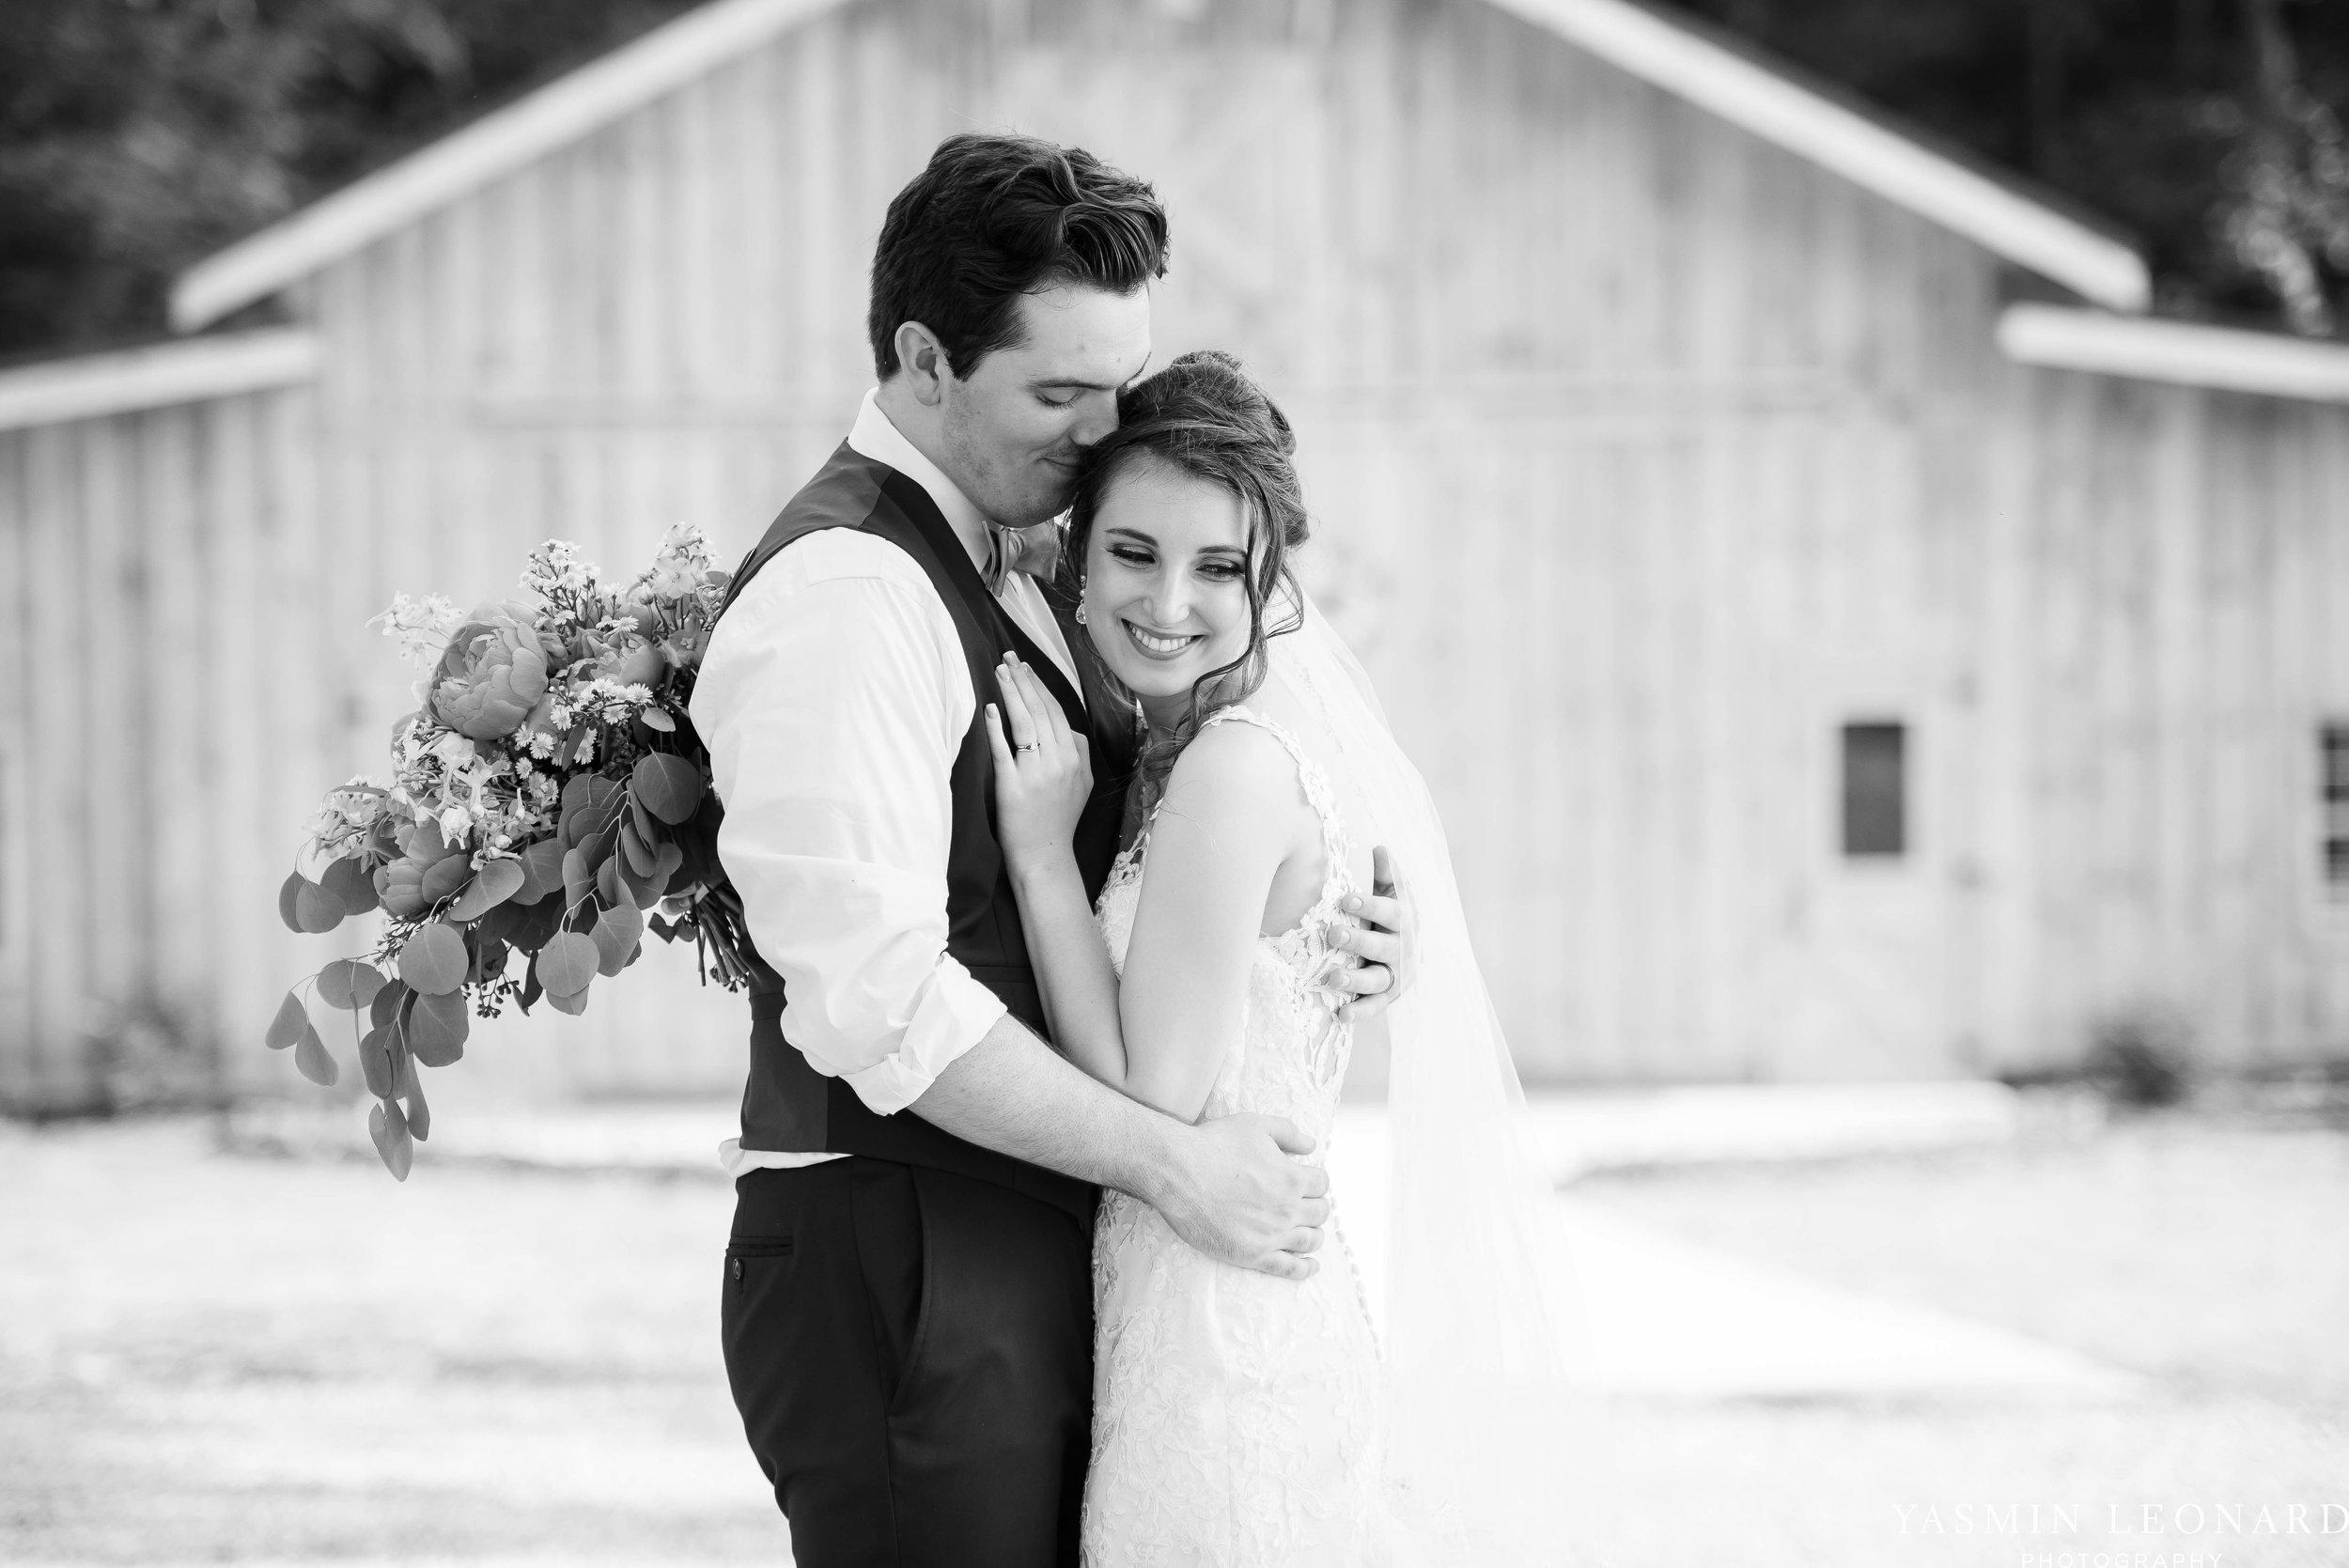 Old Homeplace Vineyard - NC Weddings - Outdoor Summer Weddings - Peony Boutique - Vineyard Wedding - NC Photographer - Yasmin Leonard Photography-38.jpg